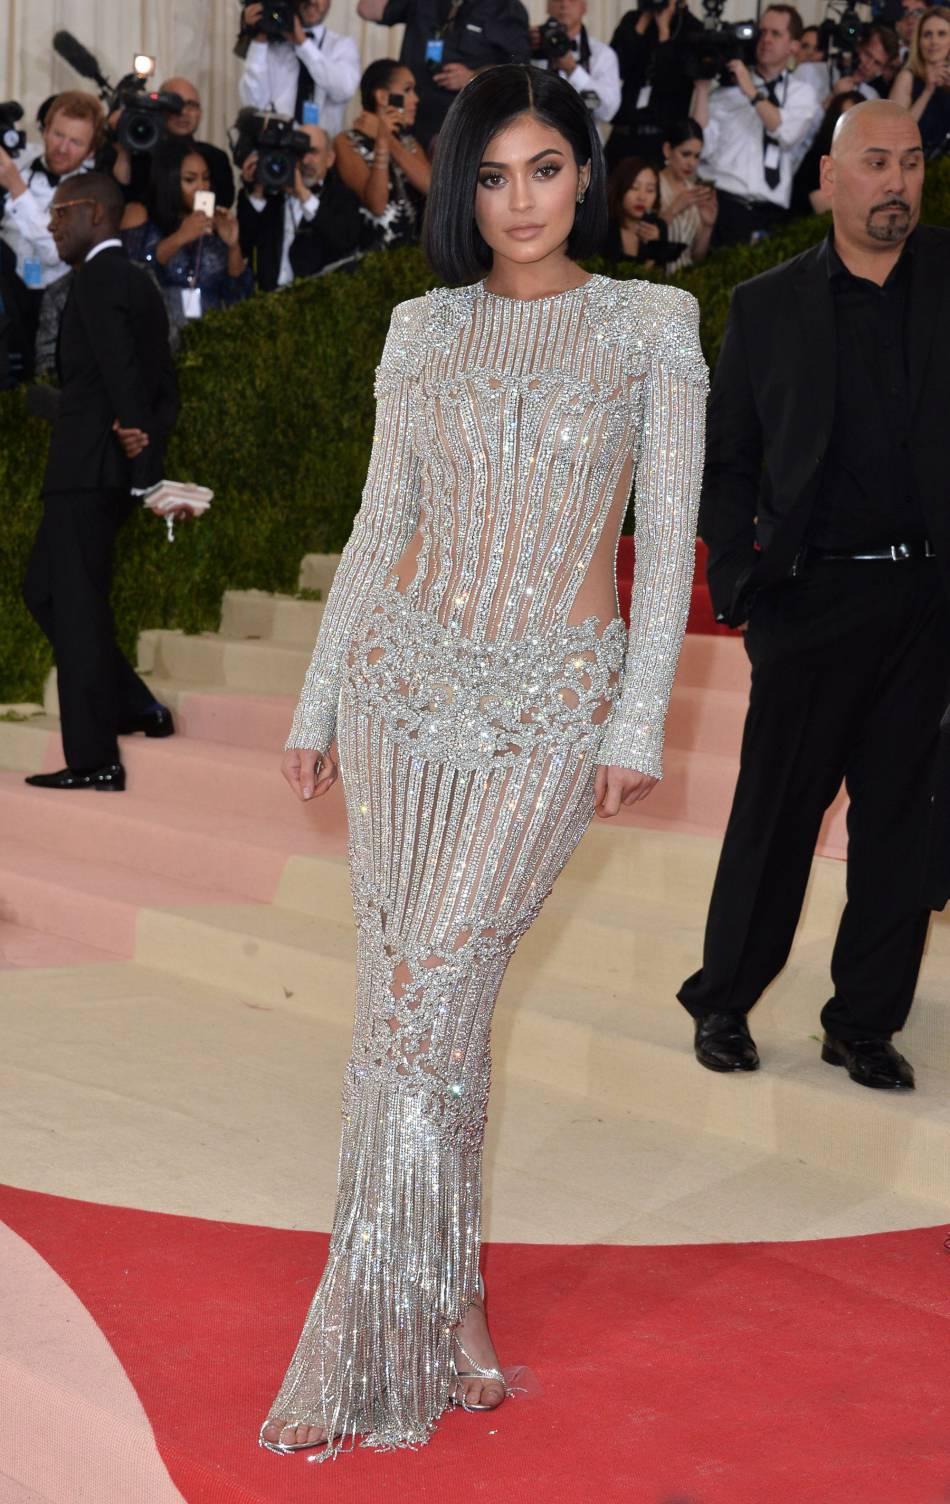 Kylie Jenner a choisi une robe Balmain pour le Met Ball.